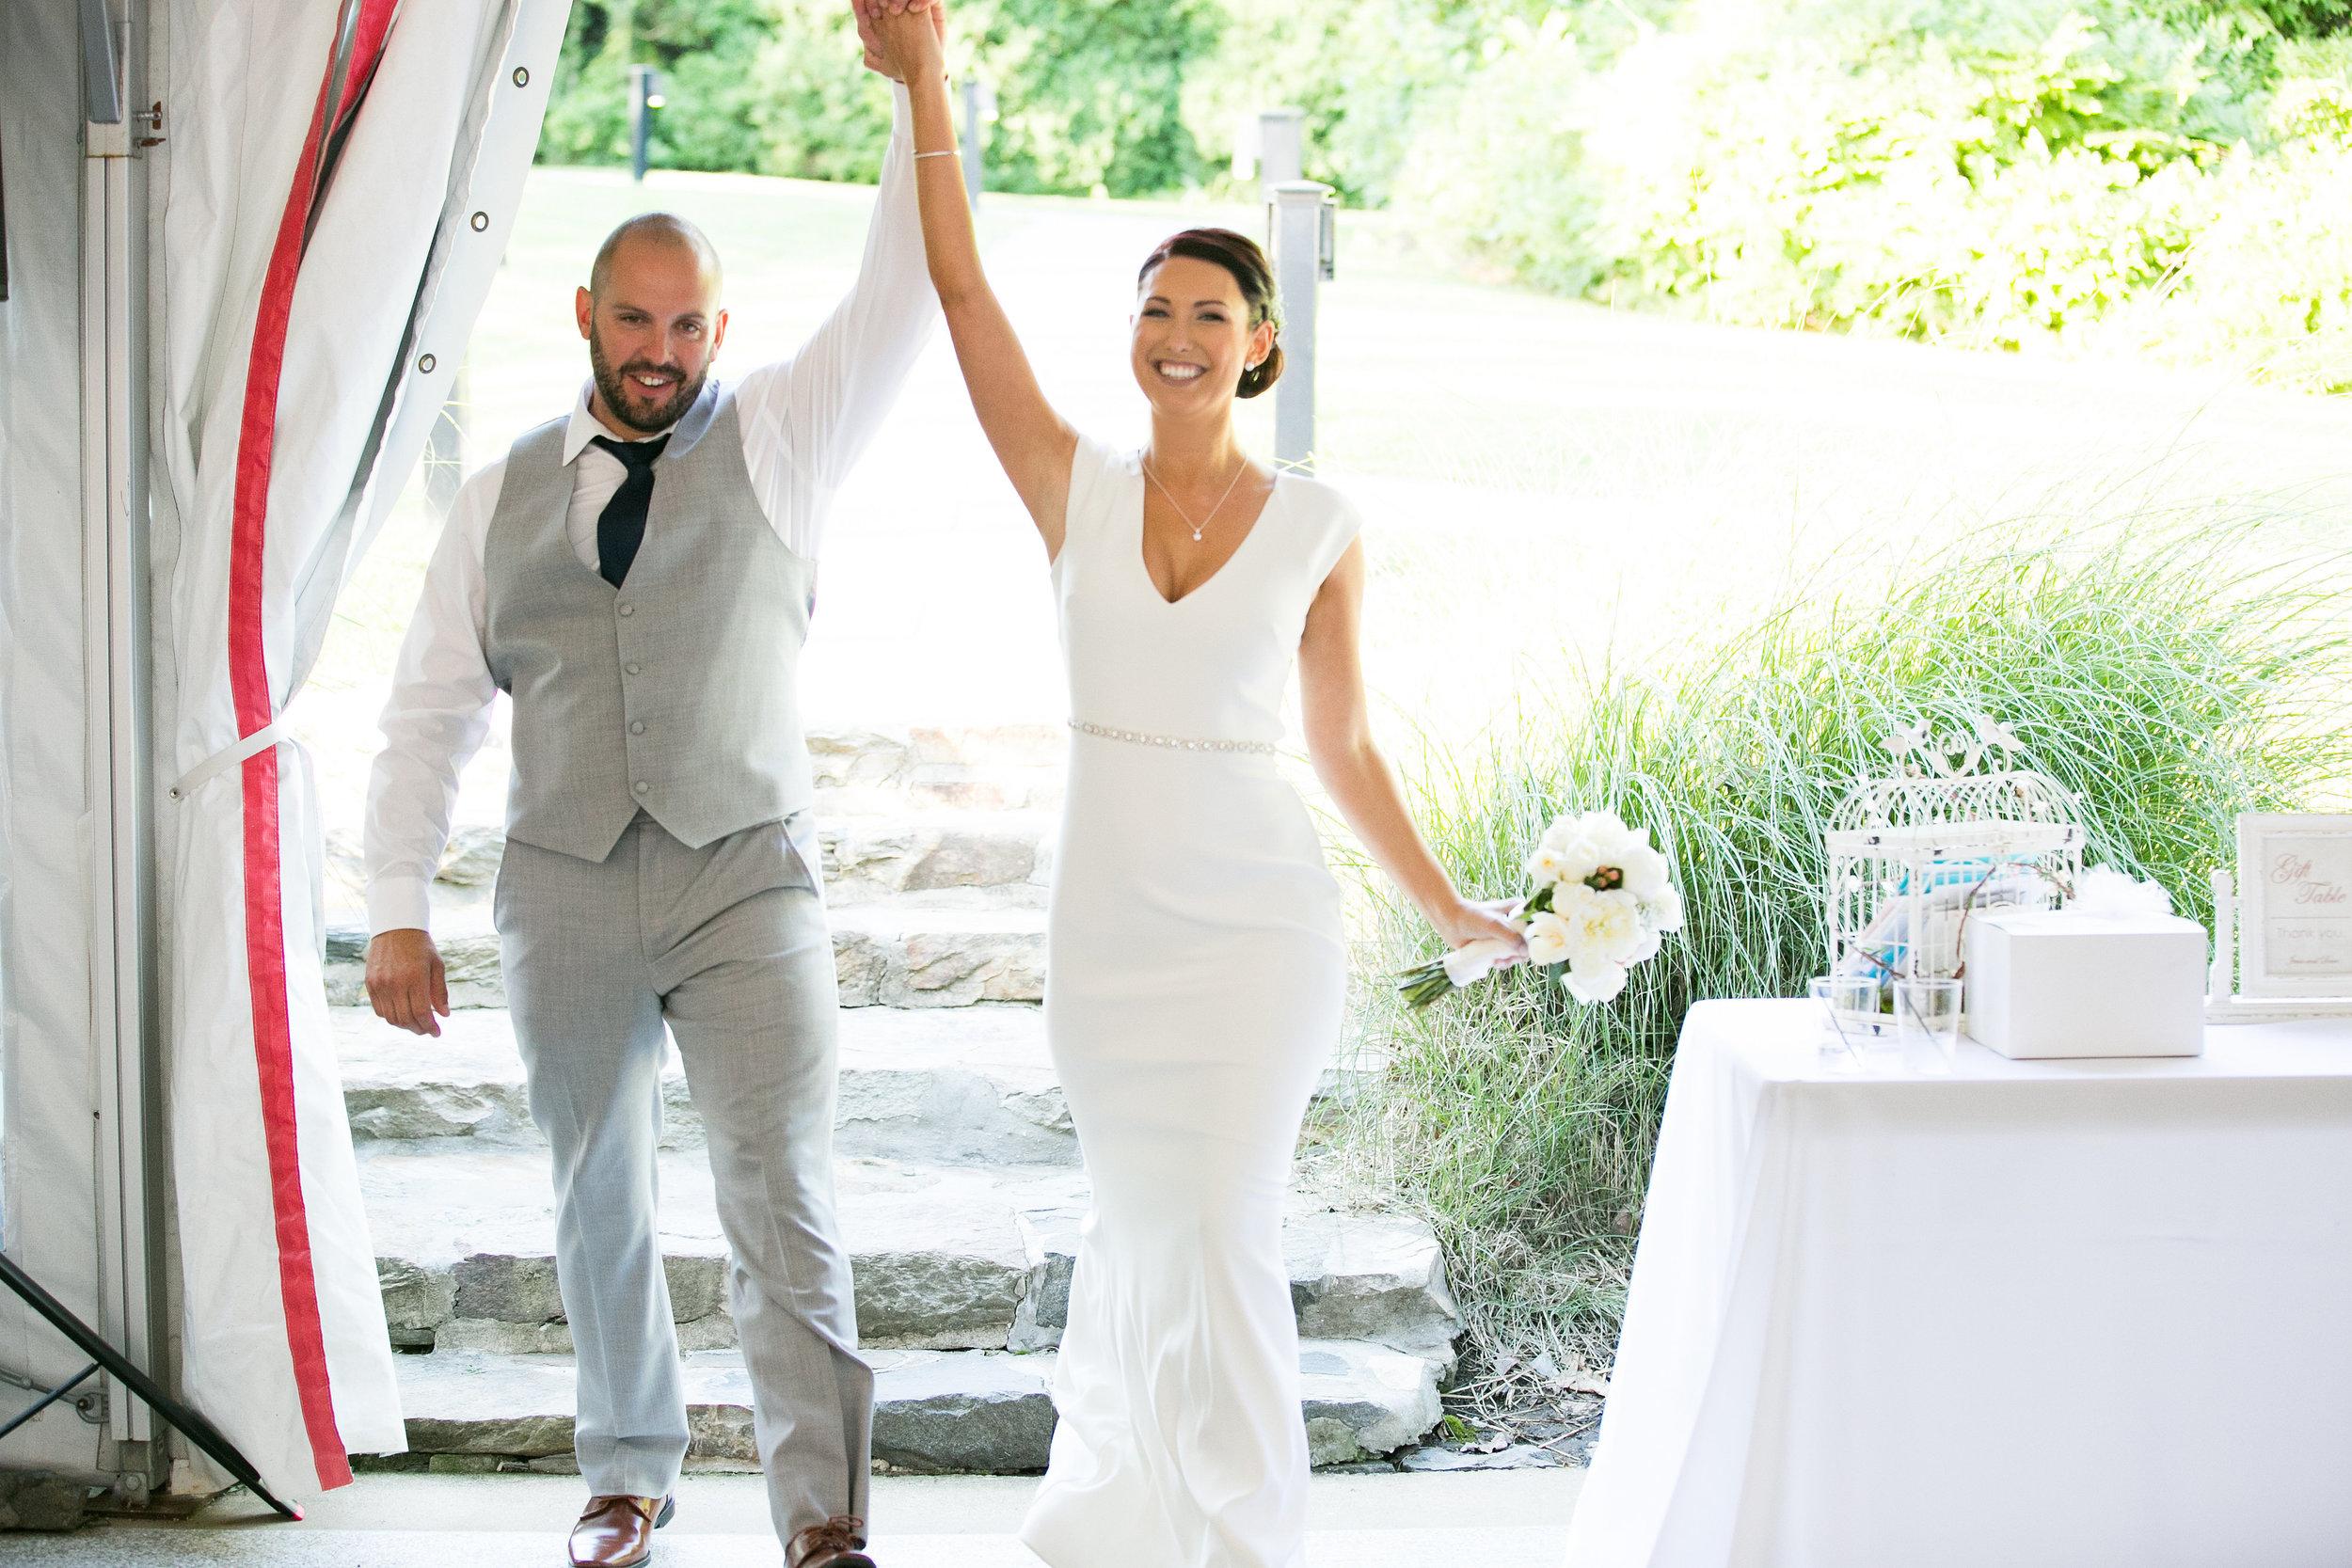 Pure elegance events Tynise Kee dc wedding planner va wedding planner rust manor house leesburg -0054.jpg